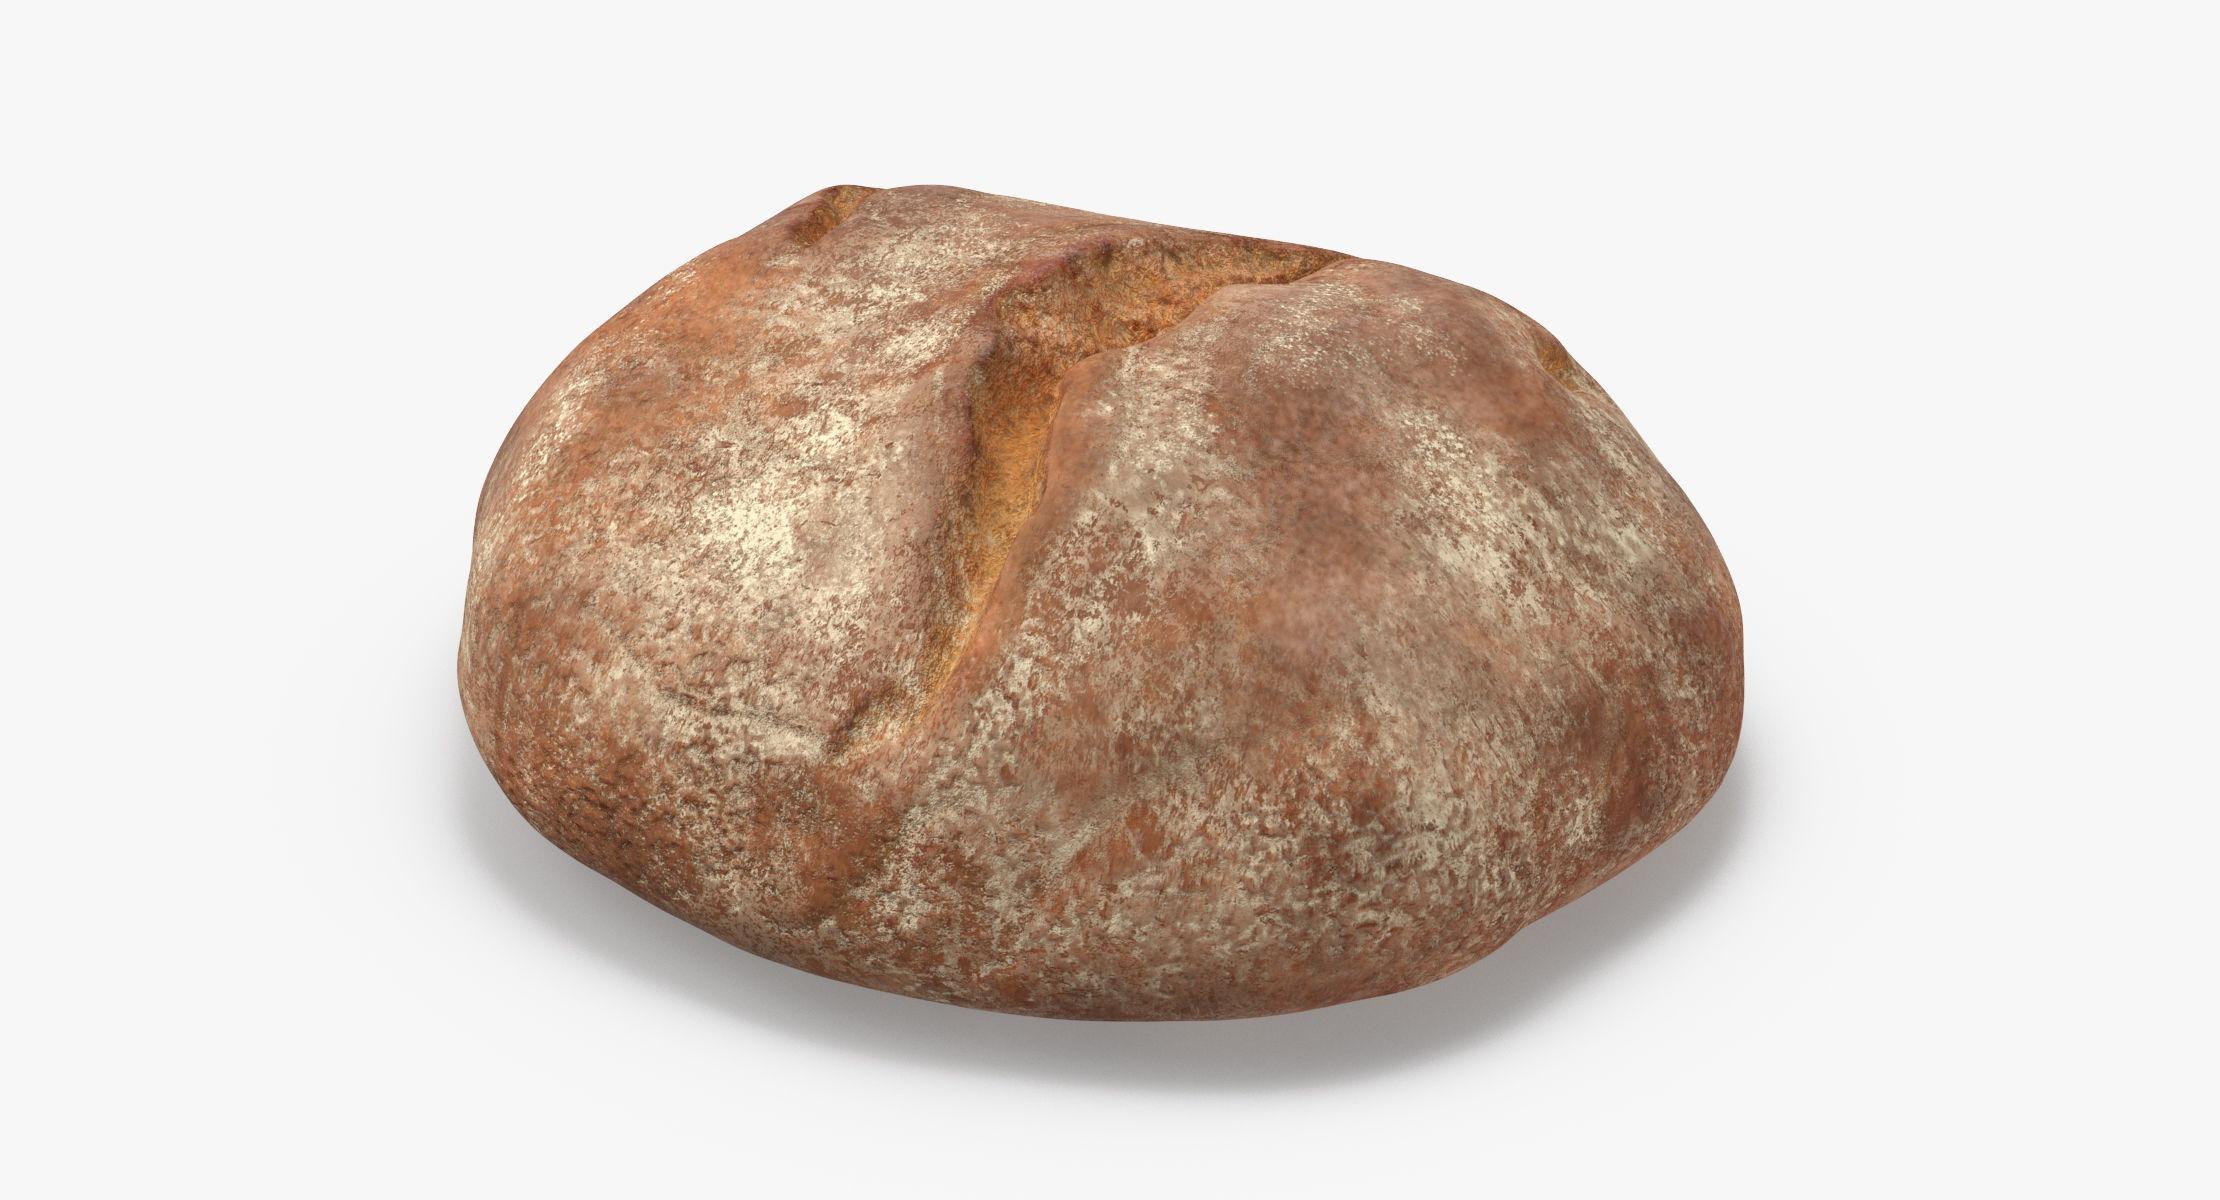 Bread Loaf 04 - reel 1